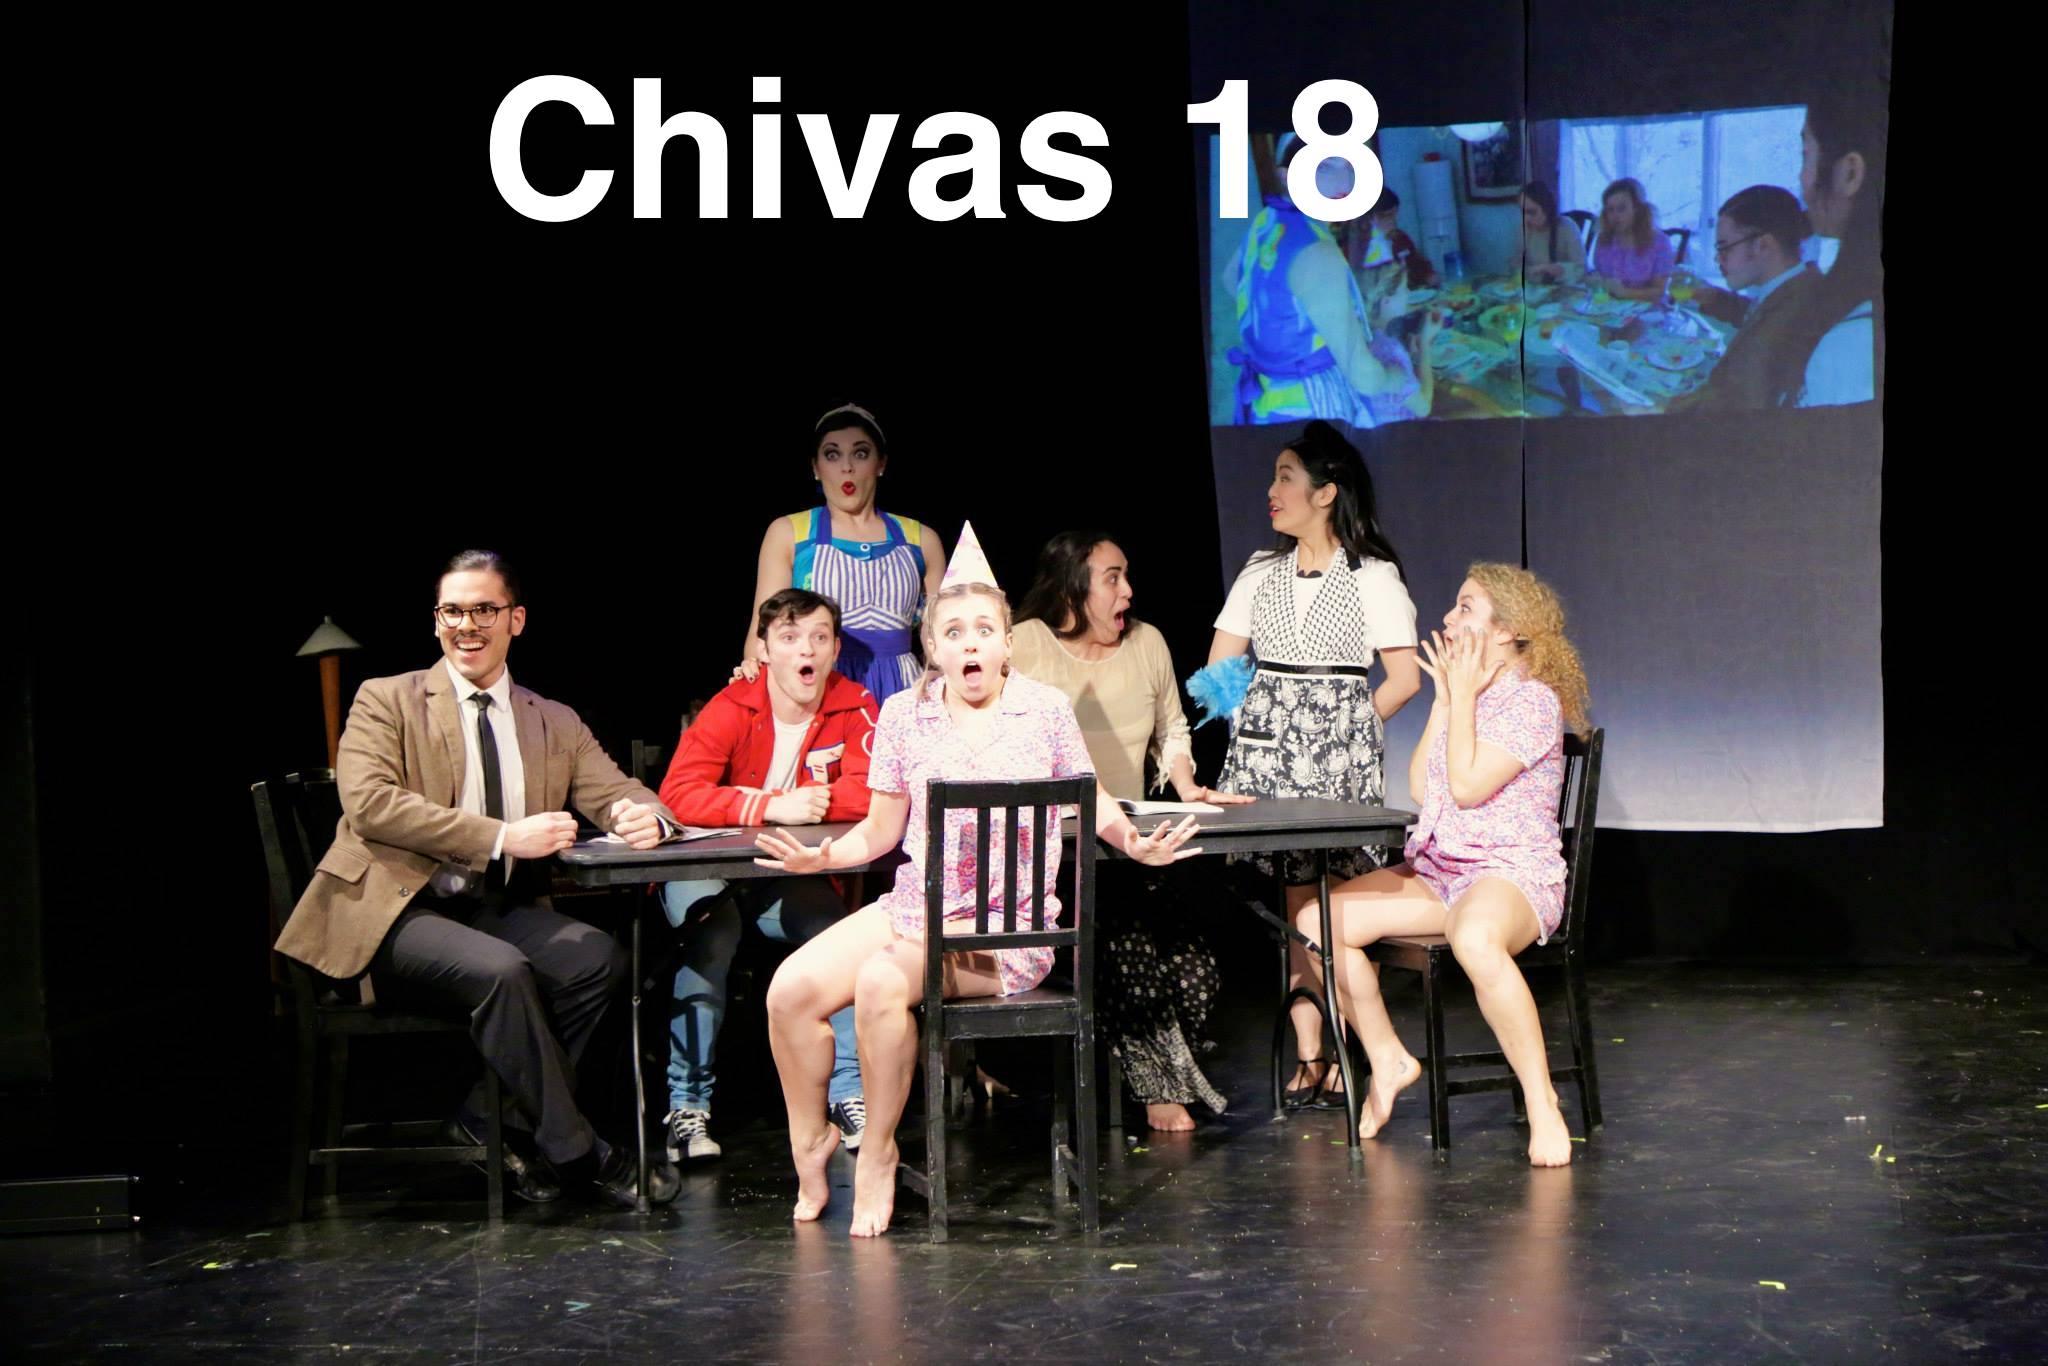 Chivas pic.jpg